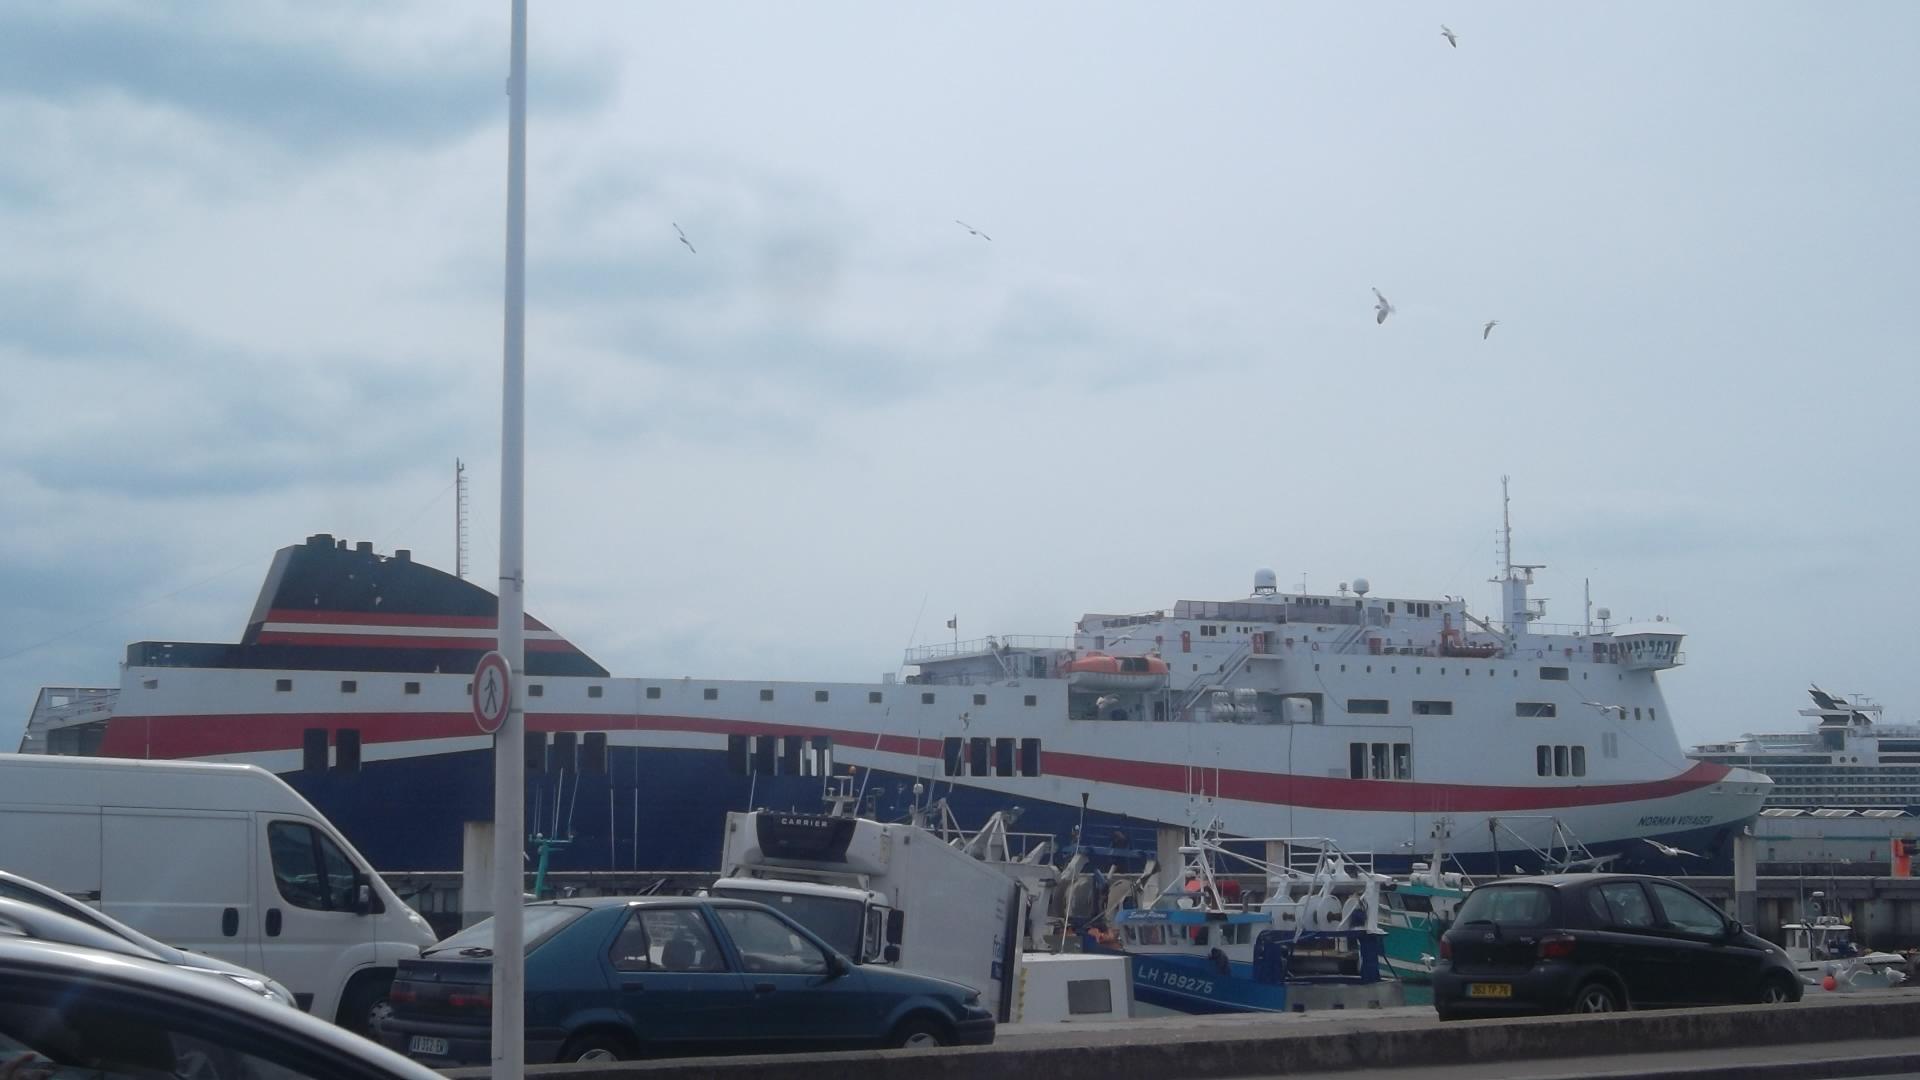 le-havre-ferries-cruises-port-my13-1